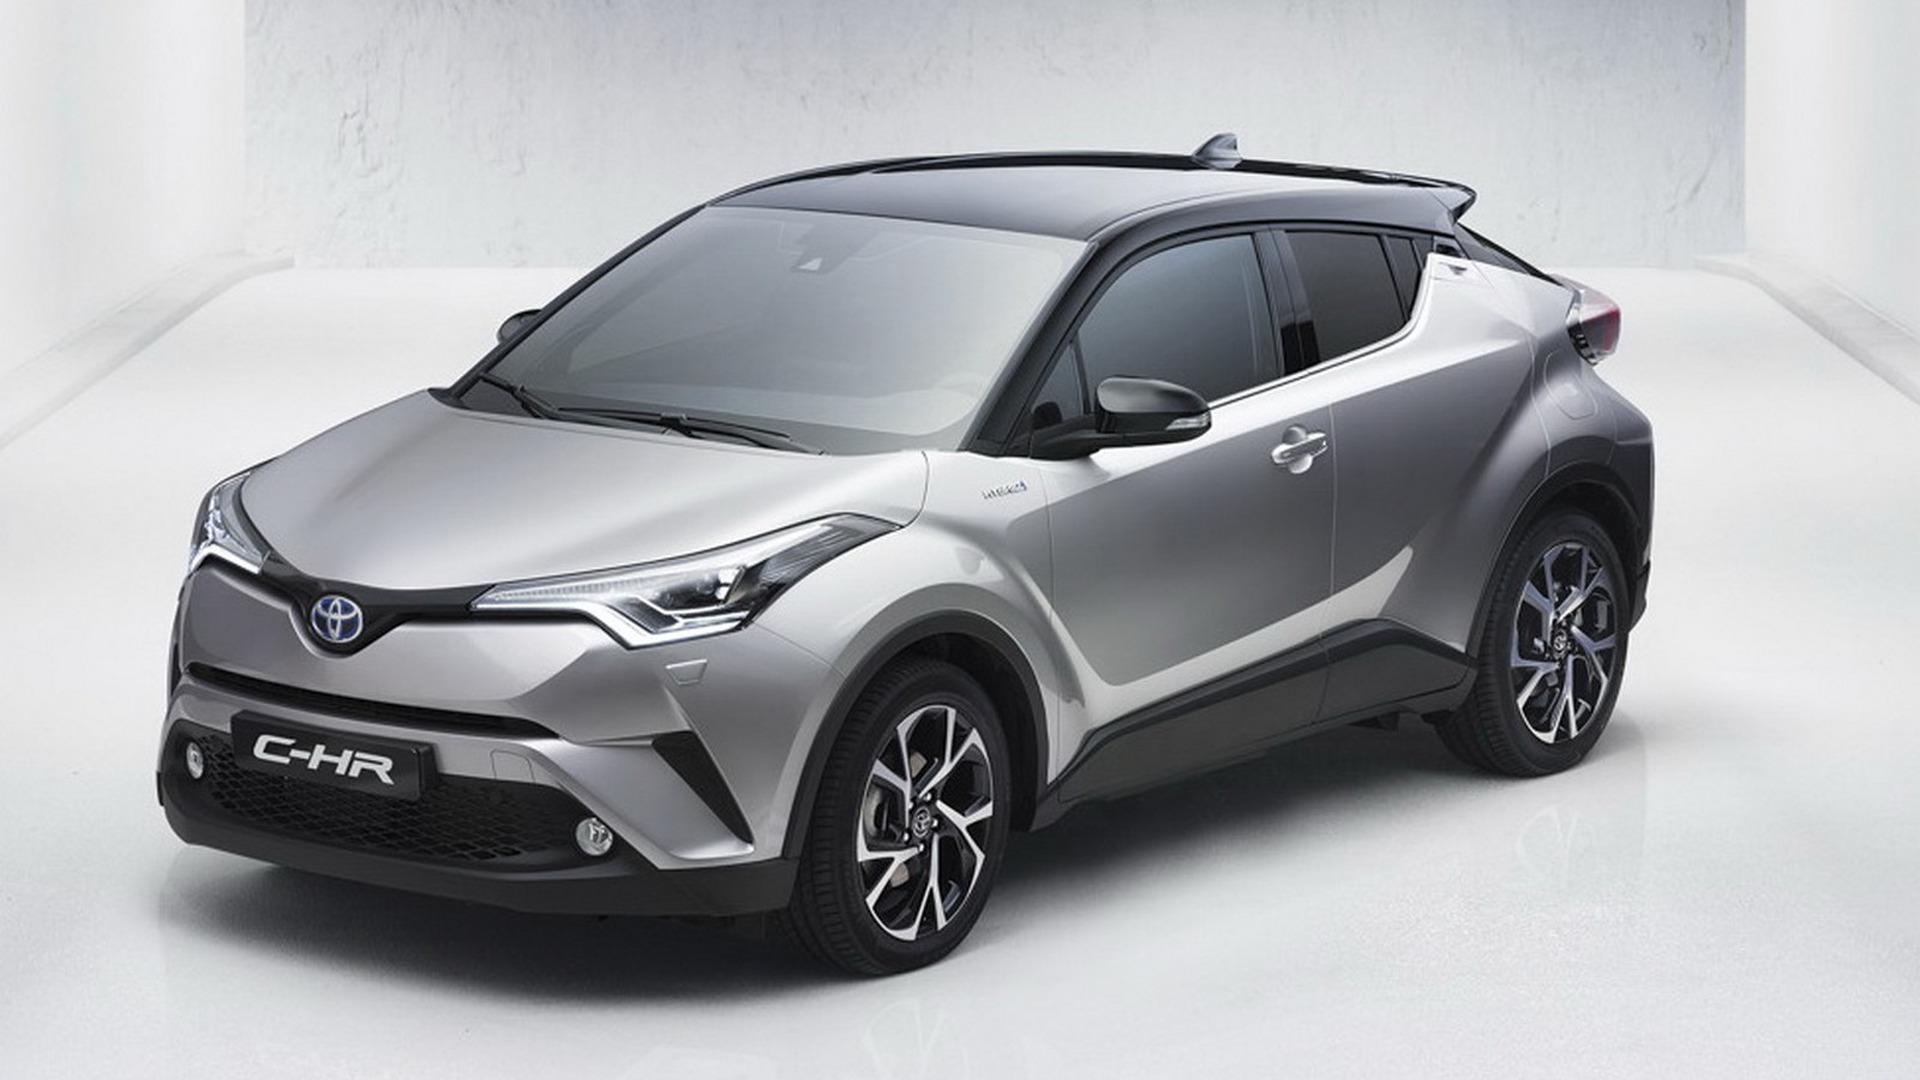 Toyota C-HR crossover leaked ahead of Geneva